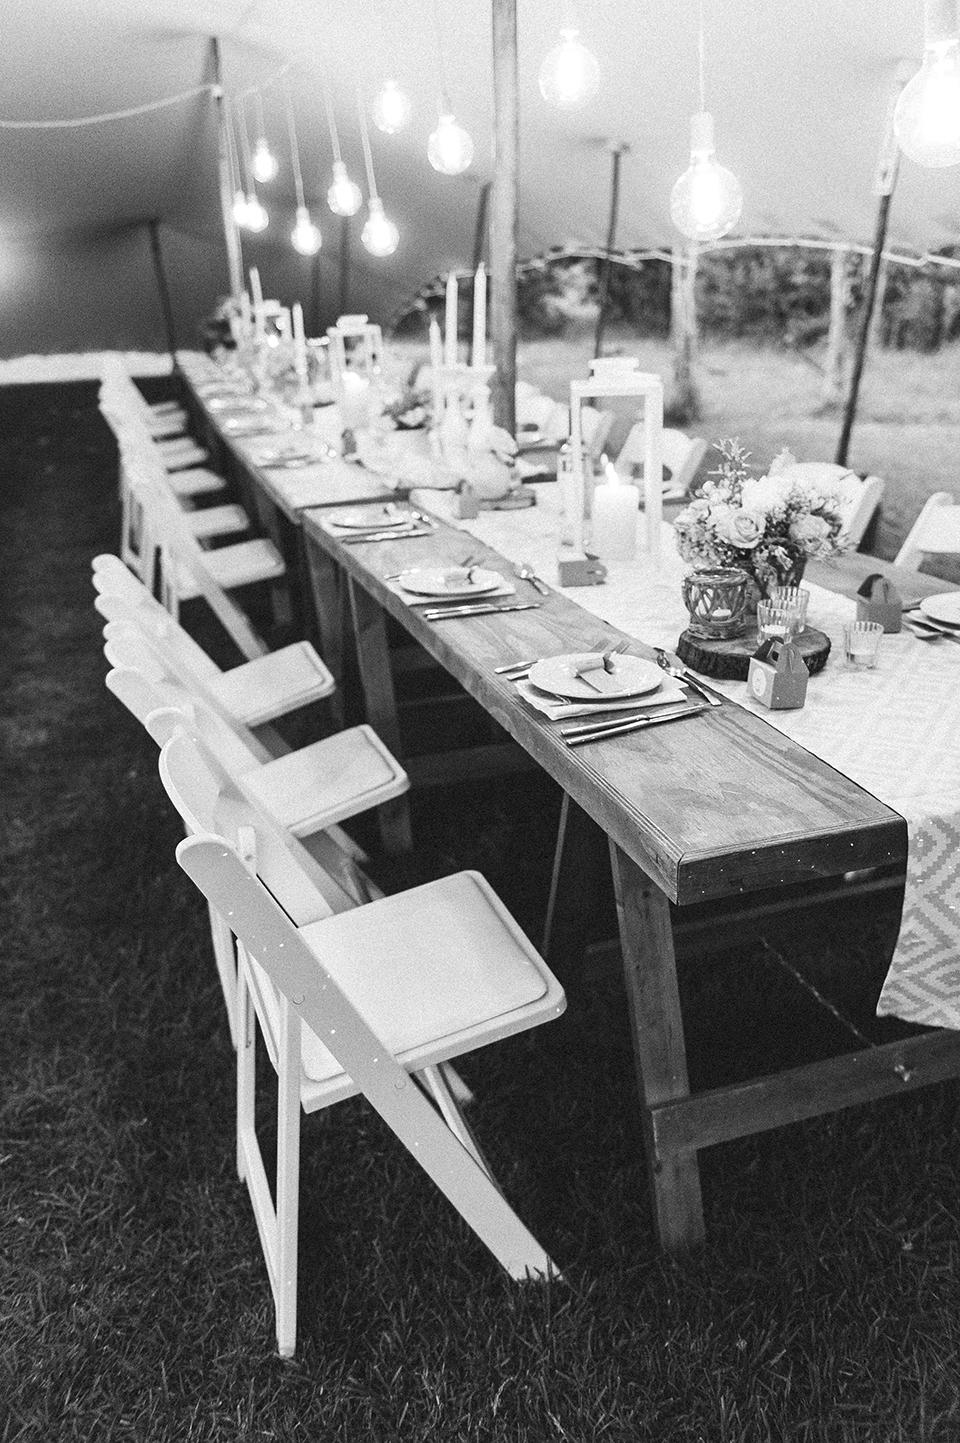 RyanParker_WeddingPhotographer_FineArt_CapeTown_Robertson_PatBusch_Hermanus_M&S_DSC_3577.jpg